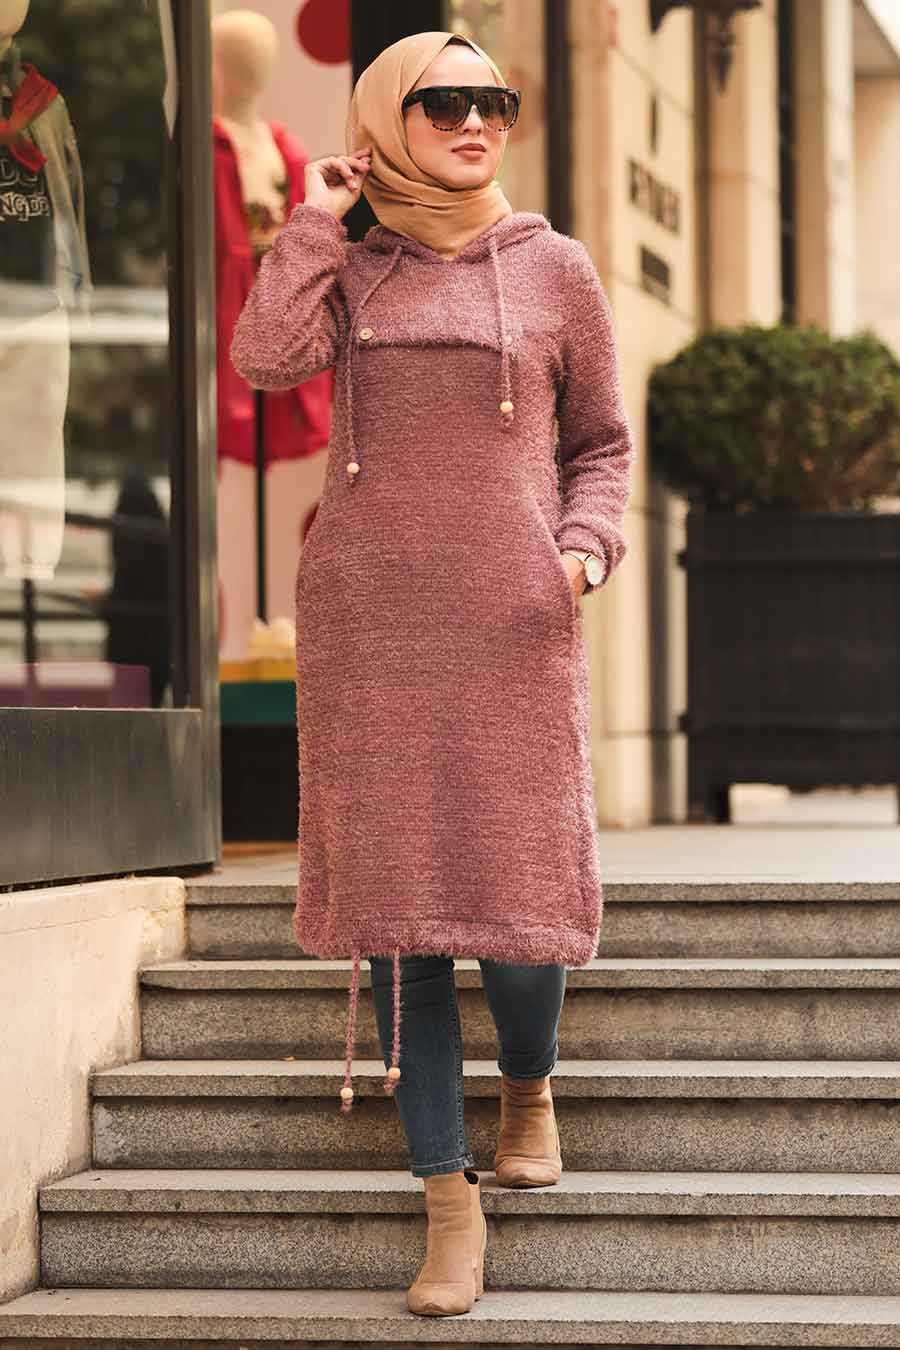 Dusty Rose Hijab Tunic 5969GK